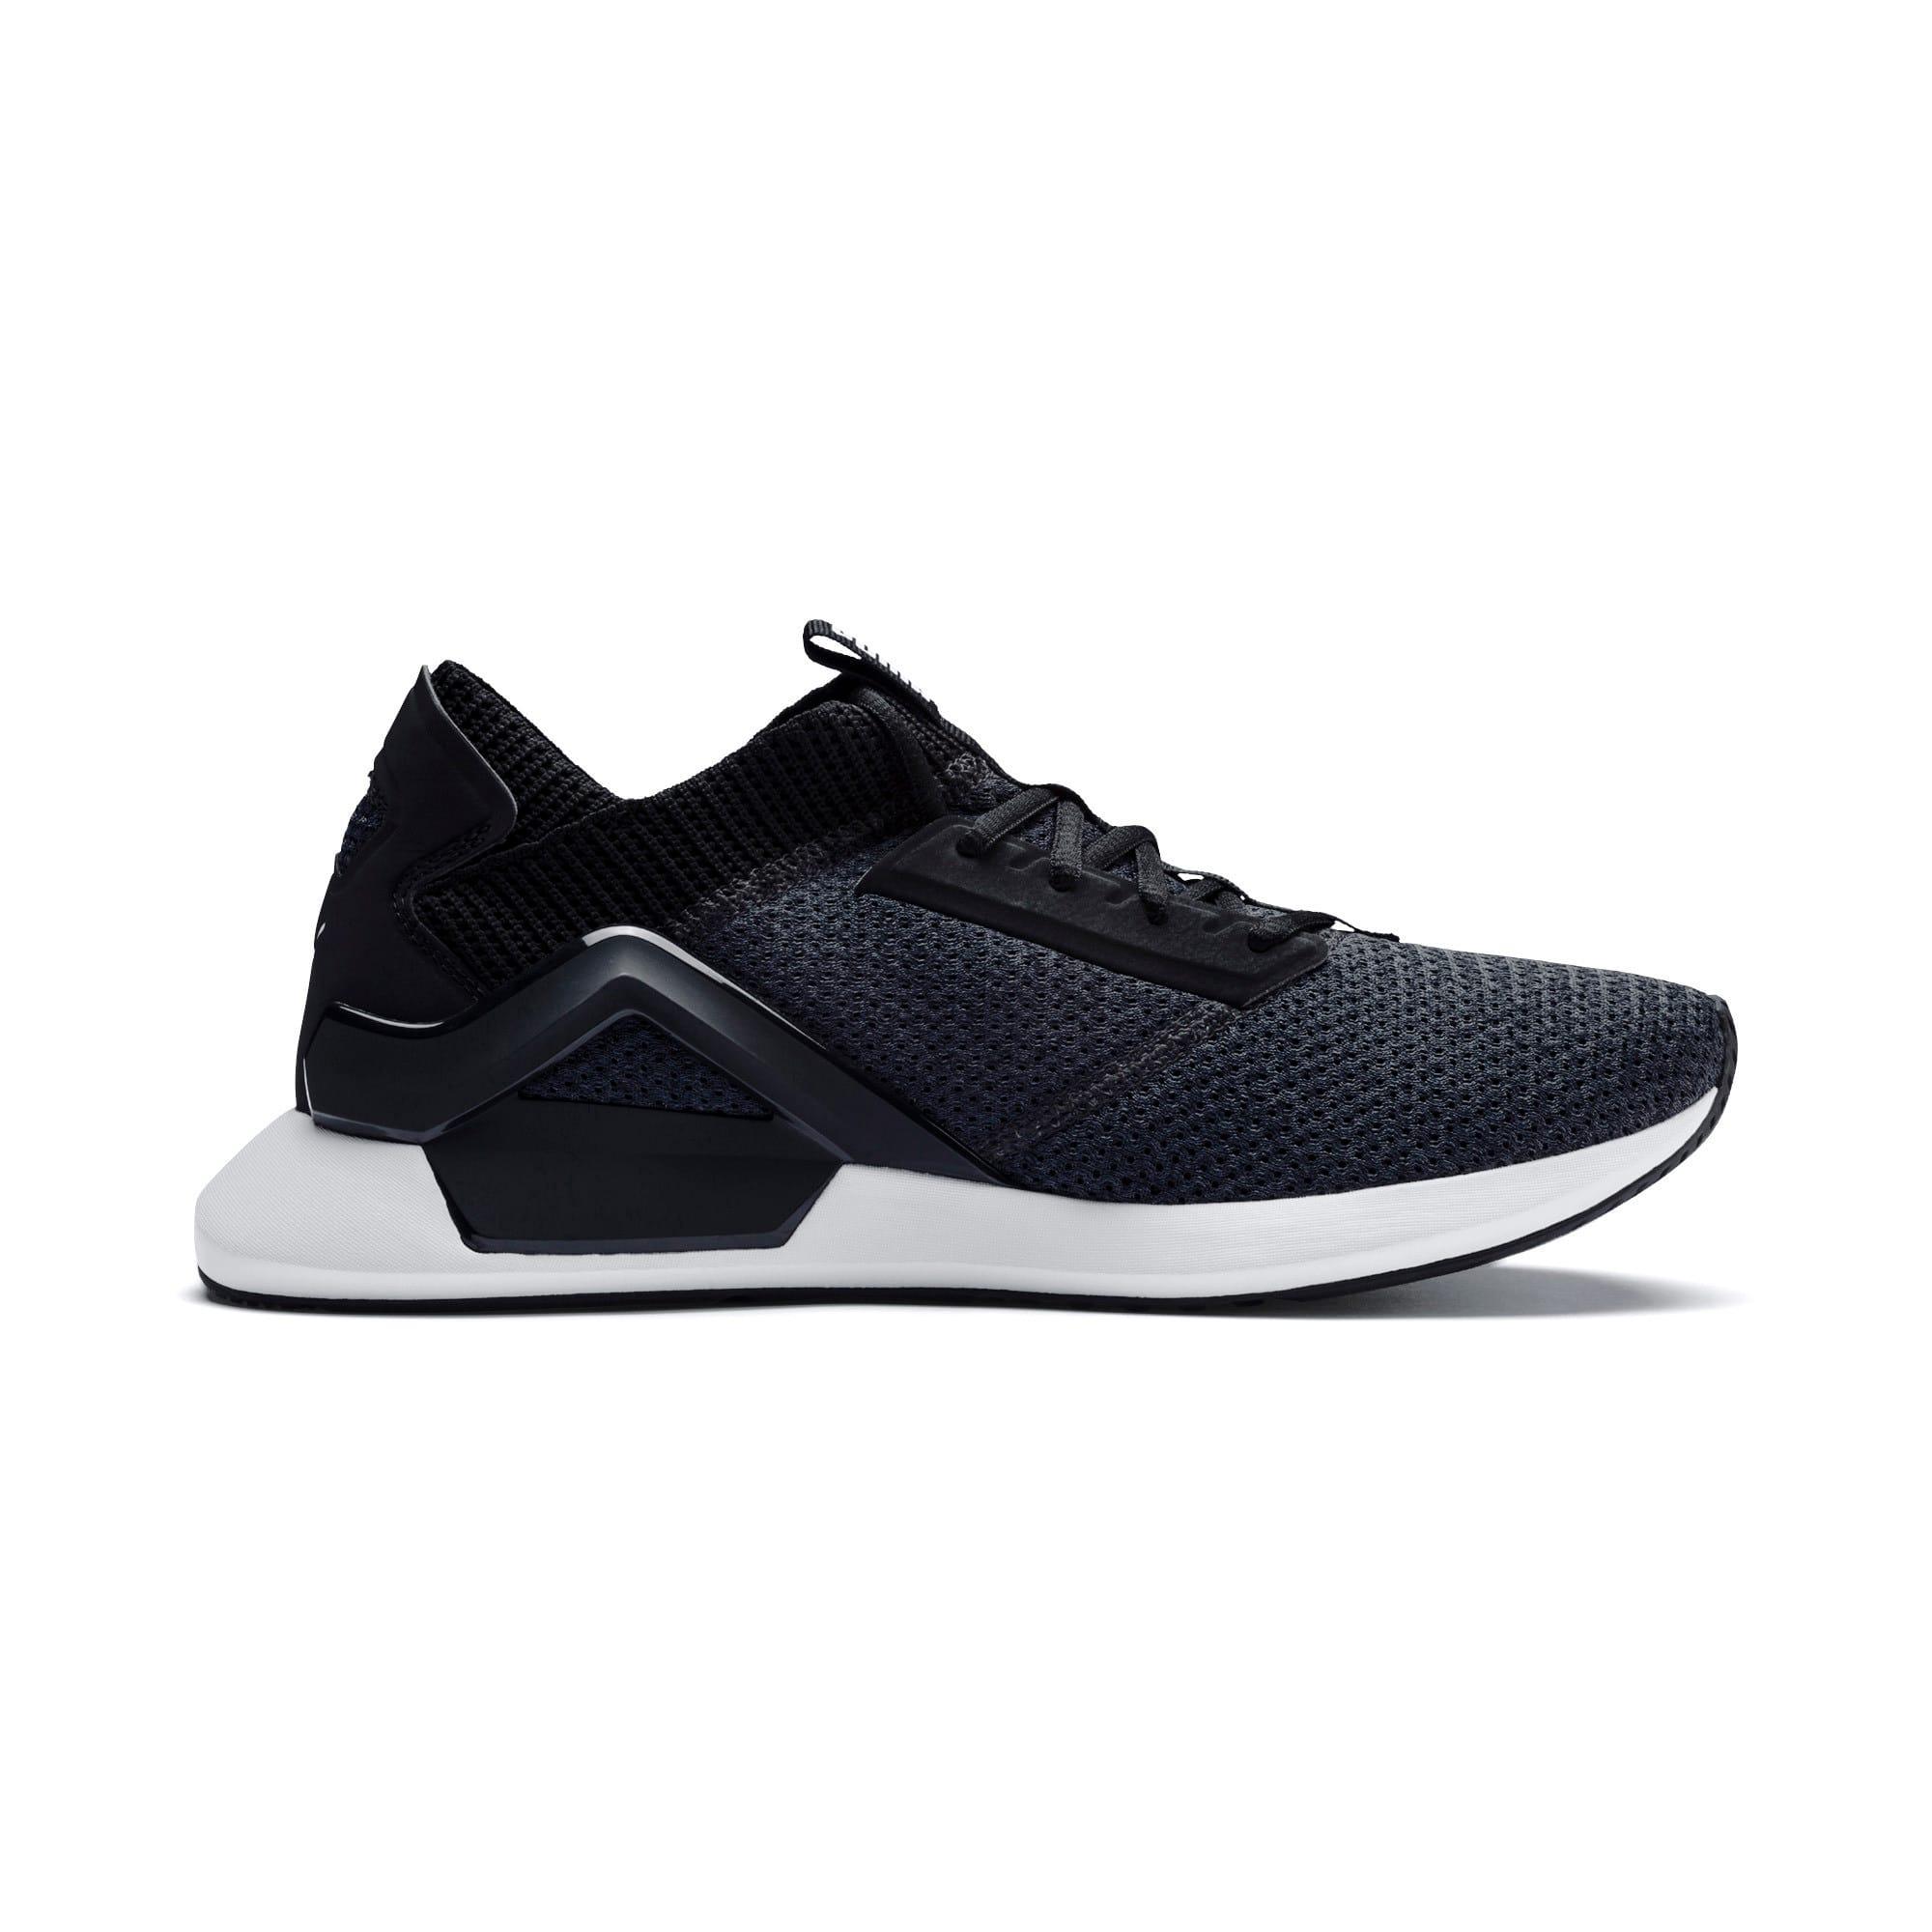 Thumbnail 5 of Rogue Men's Running Shoes, Puma Black, medium